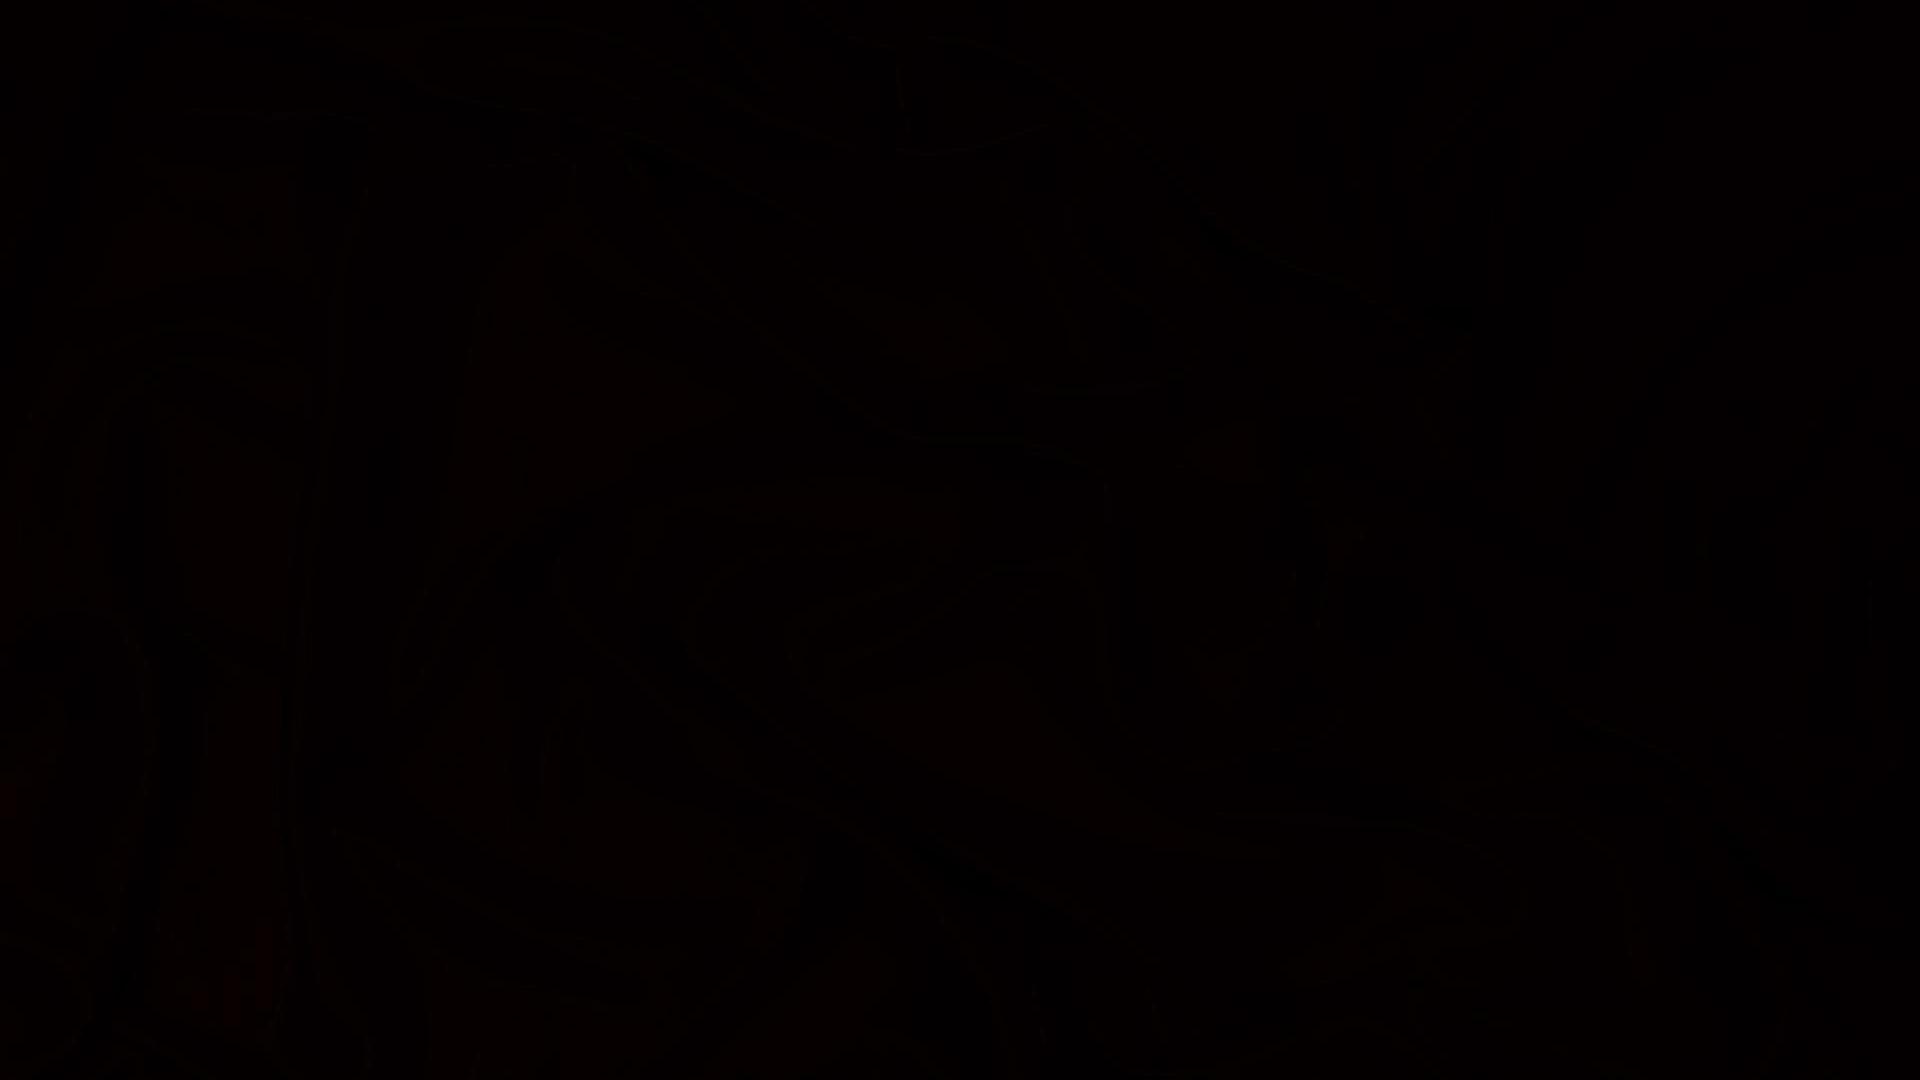 All Blacks Wallpaper